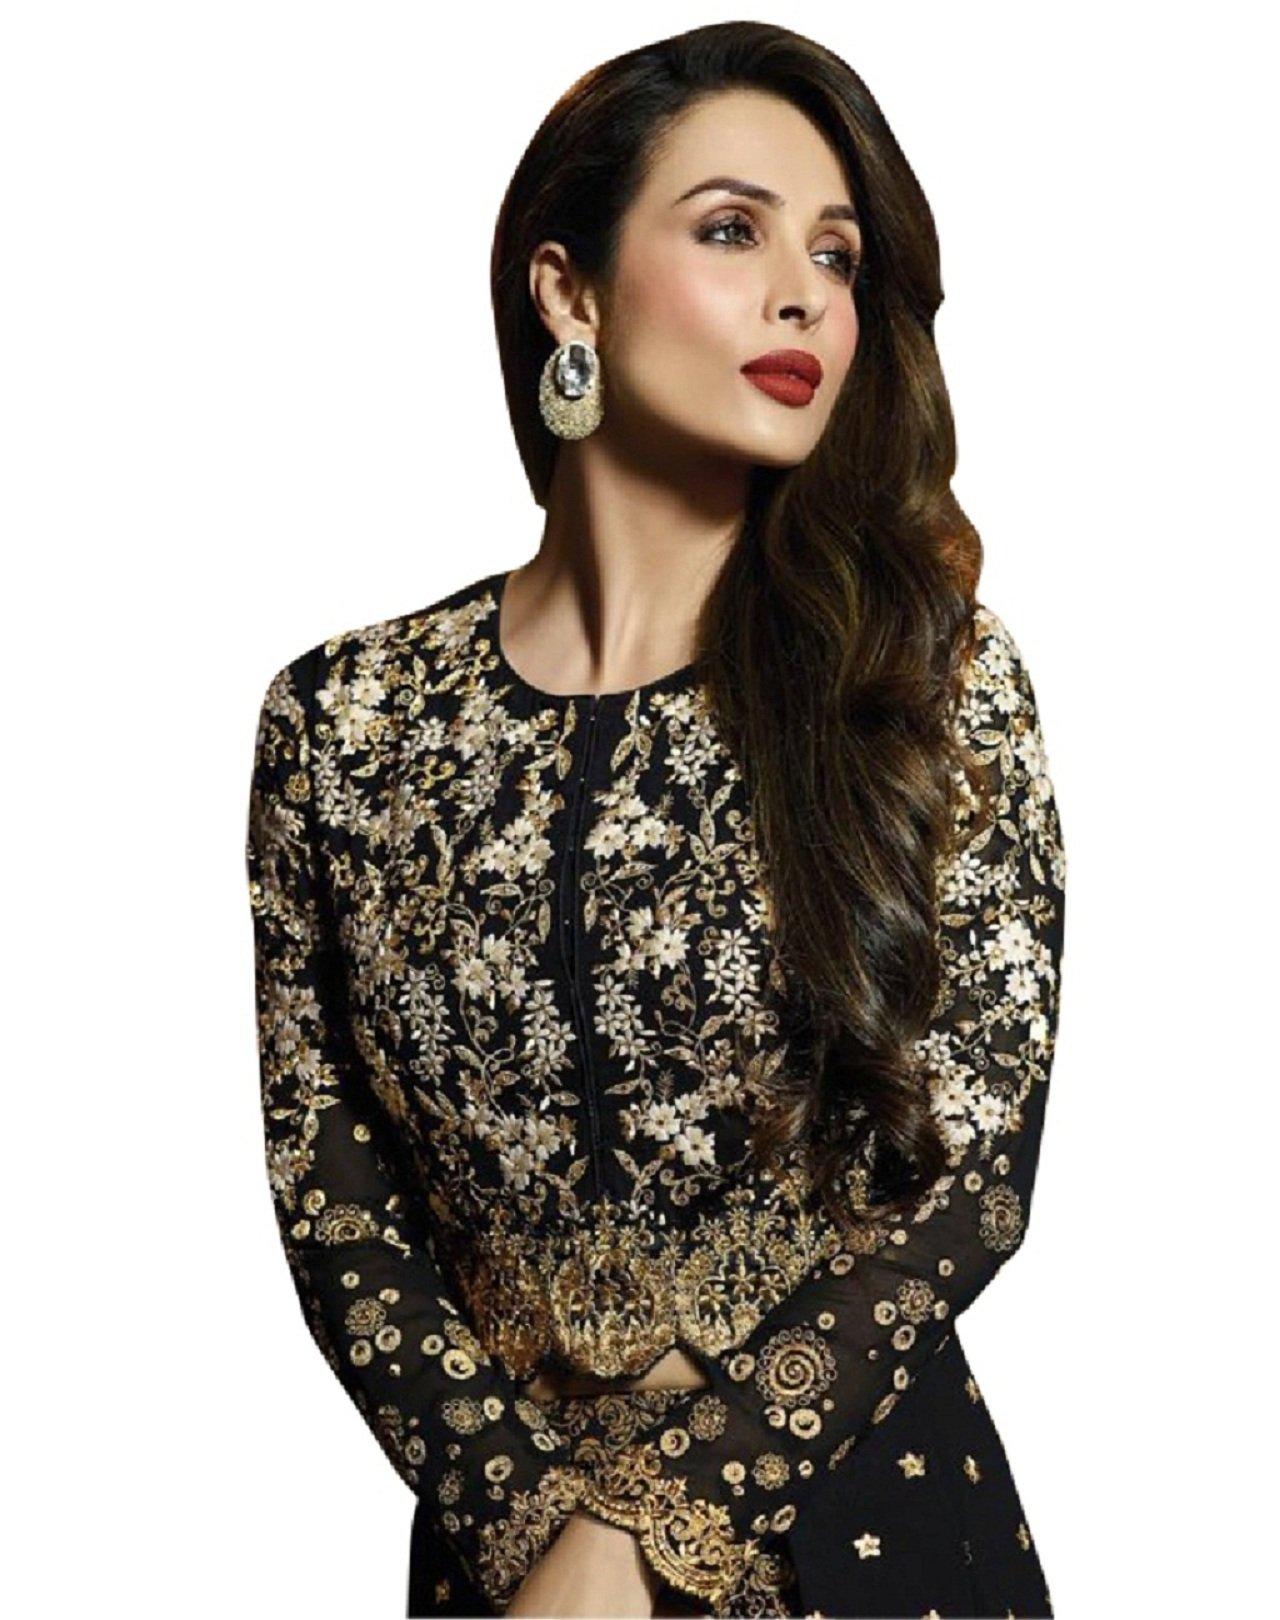 New Indian/Pakistani Designer Georgette Party Wear Anarkali Suit VF-3 (X-SMALL-36, Black)